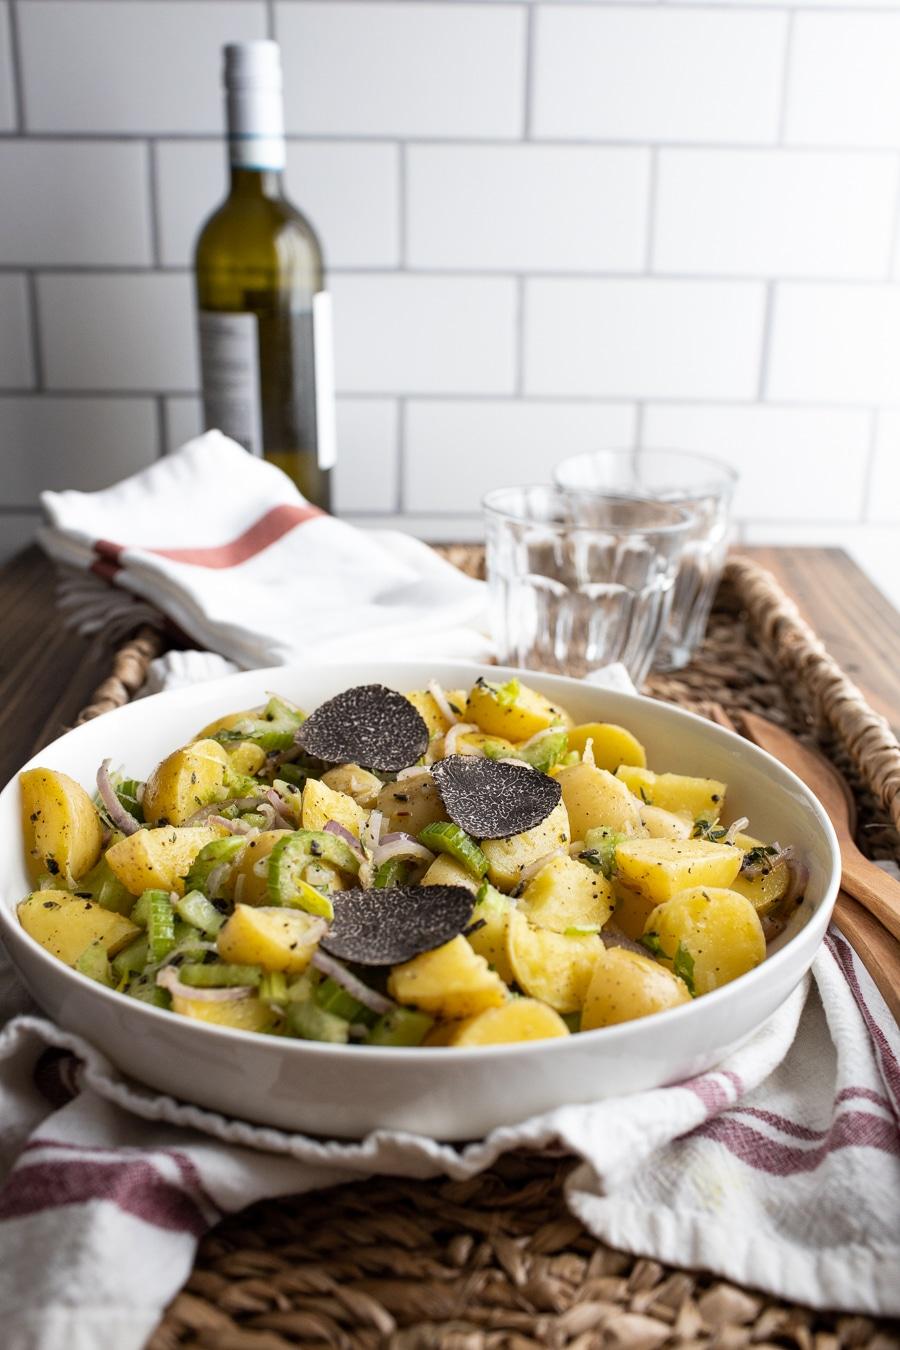 Black Truffle Potato Salad